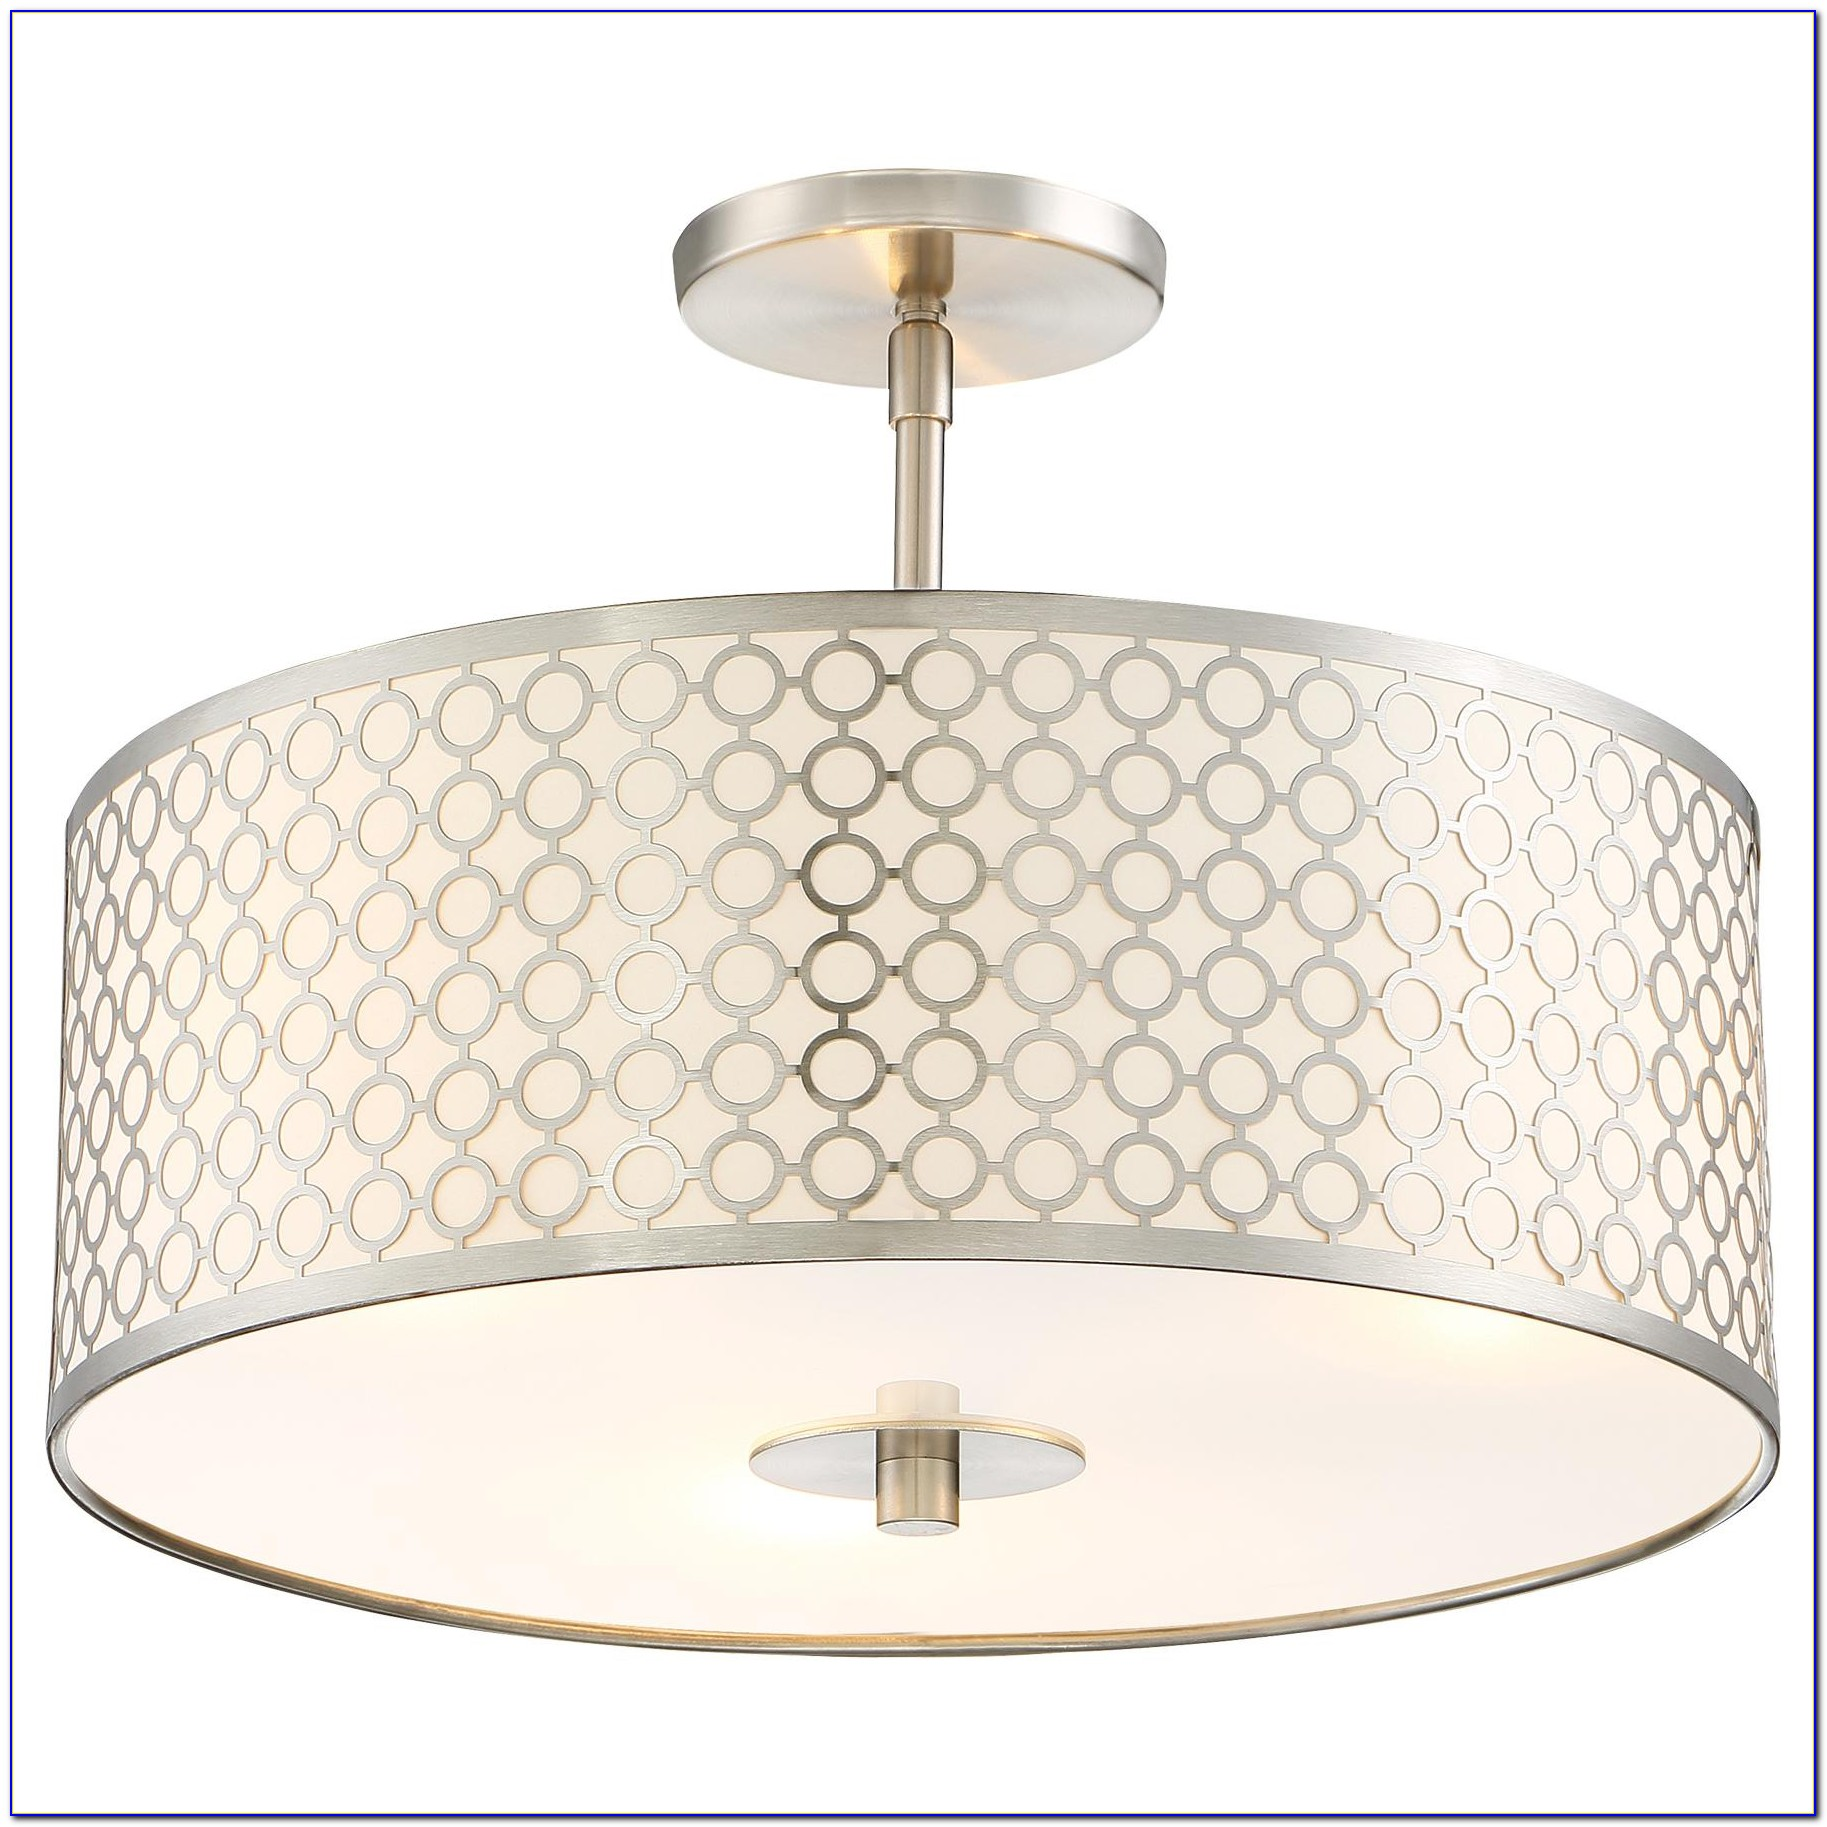 George Kovacs Ceiling Fans Ceiling Home Design Ideas R6dvzaagdm130642